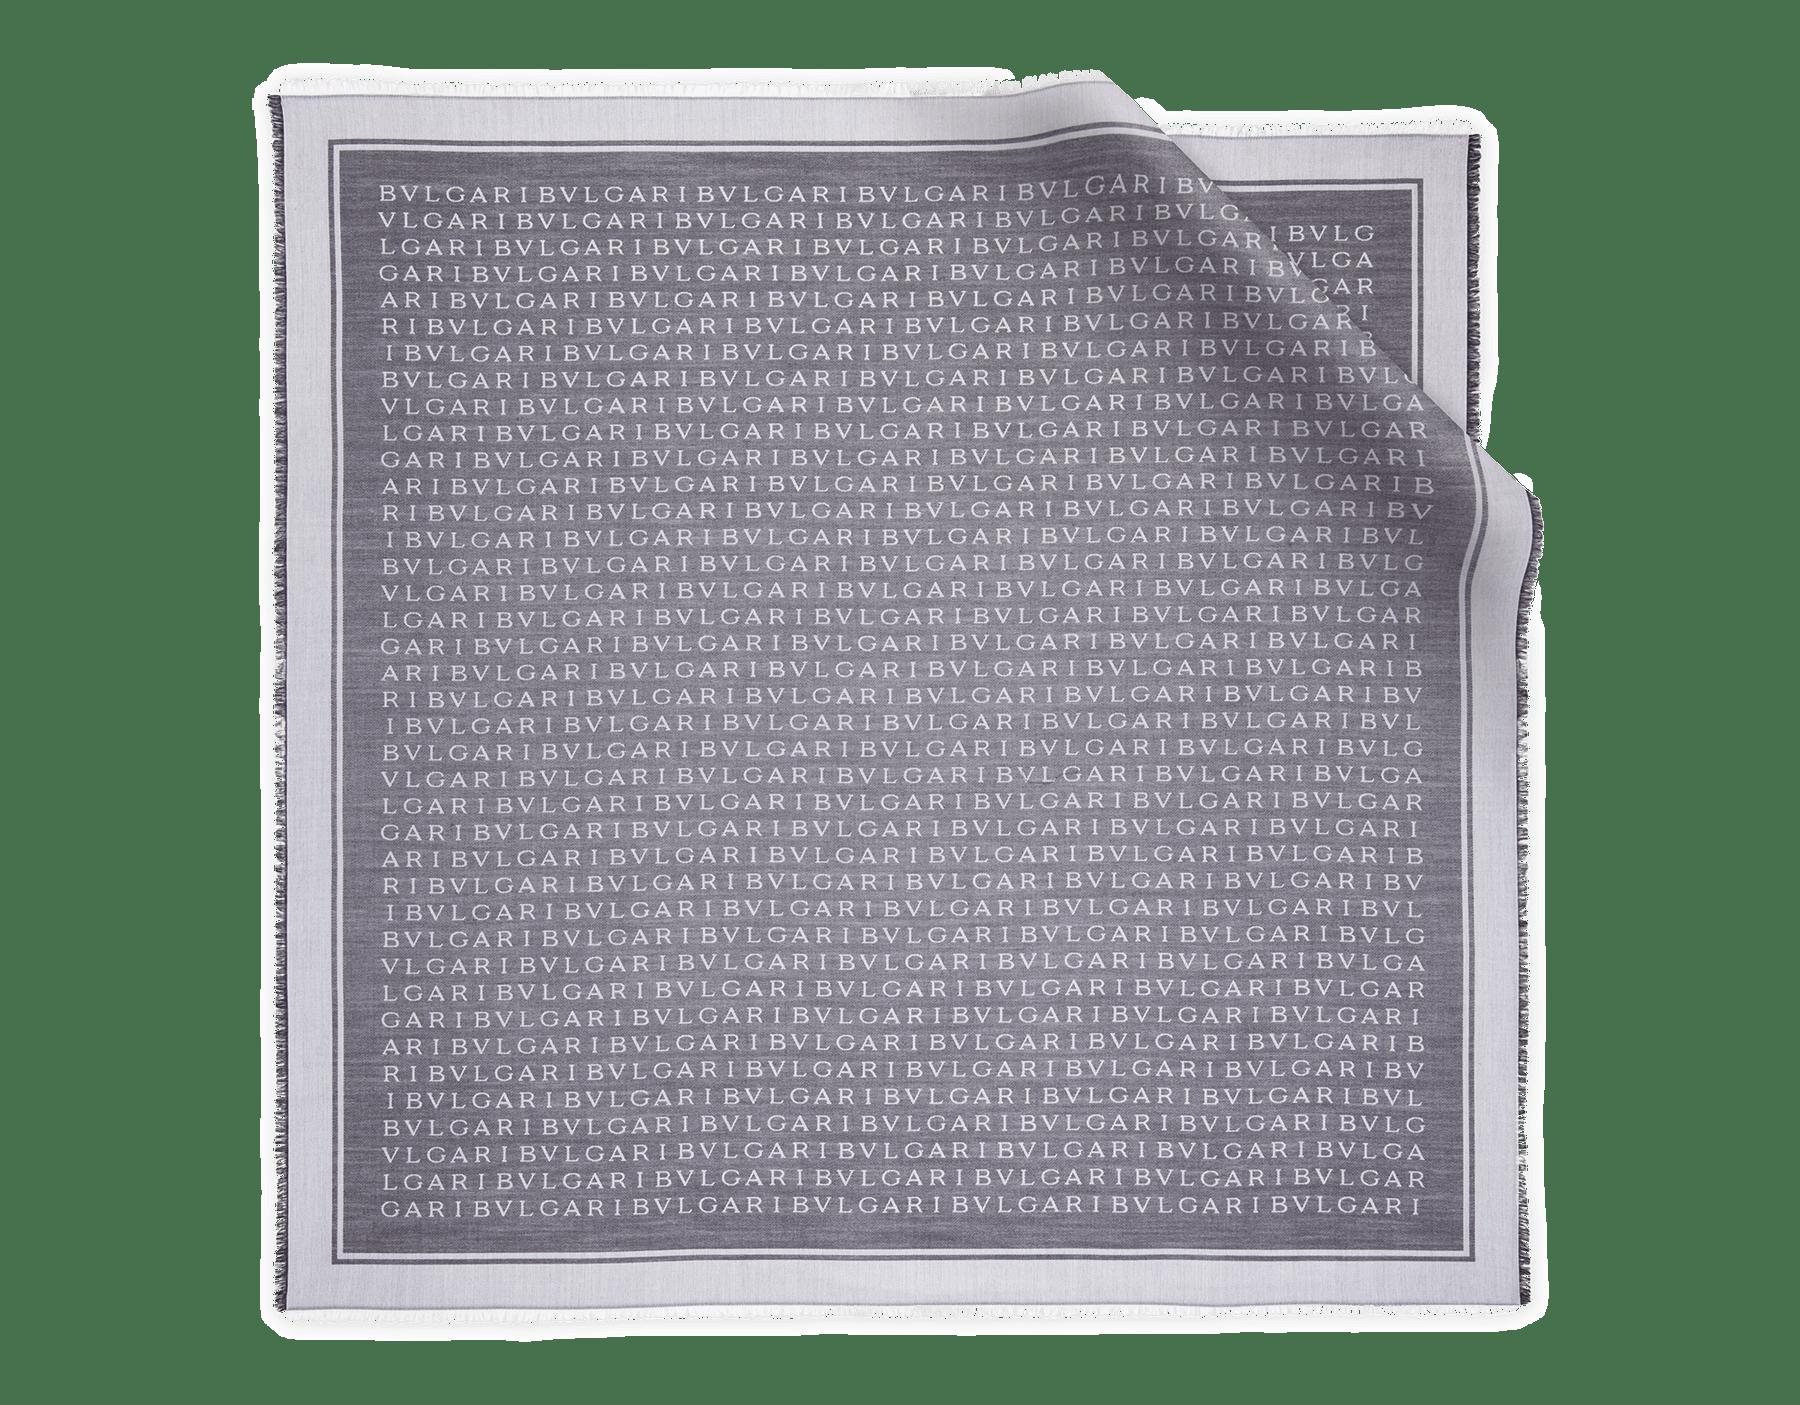 Pañuelo Lettere Maxi XL negro de lana de seda fina. 244235 image 2